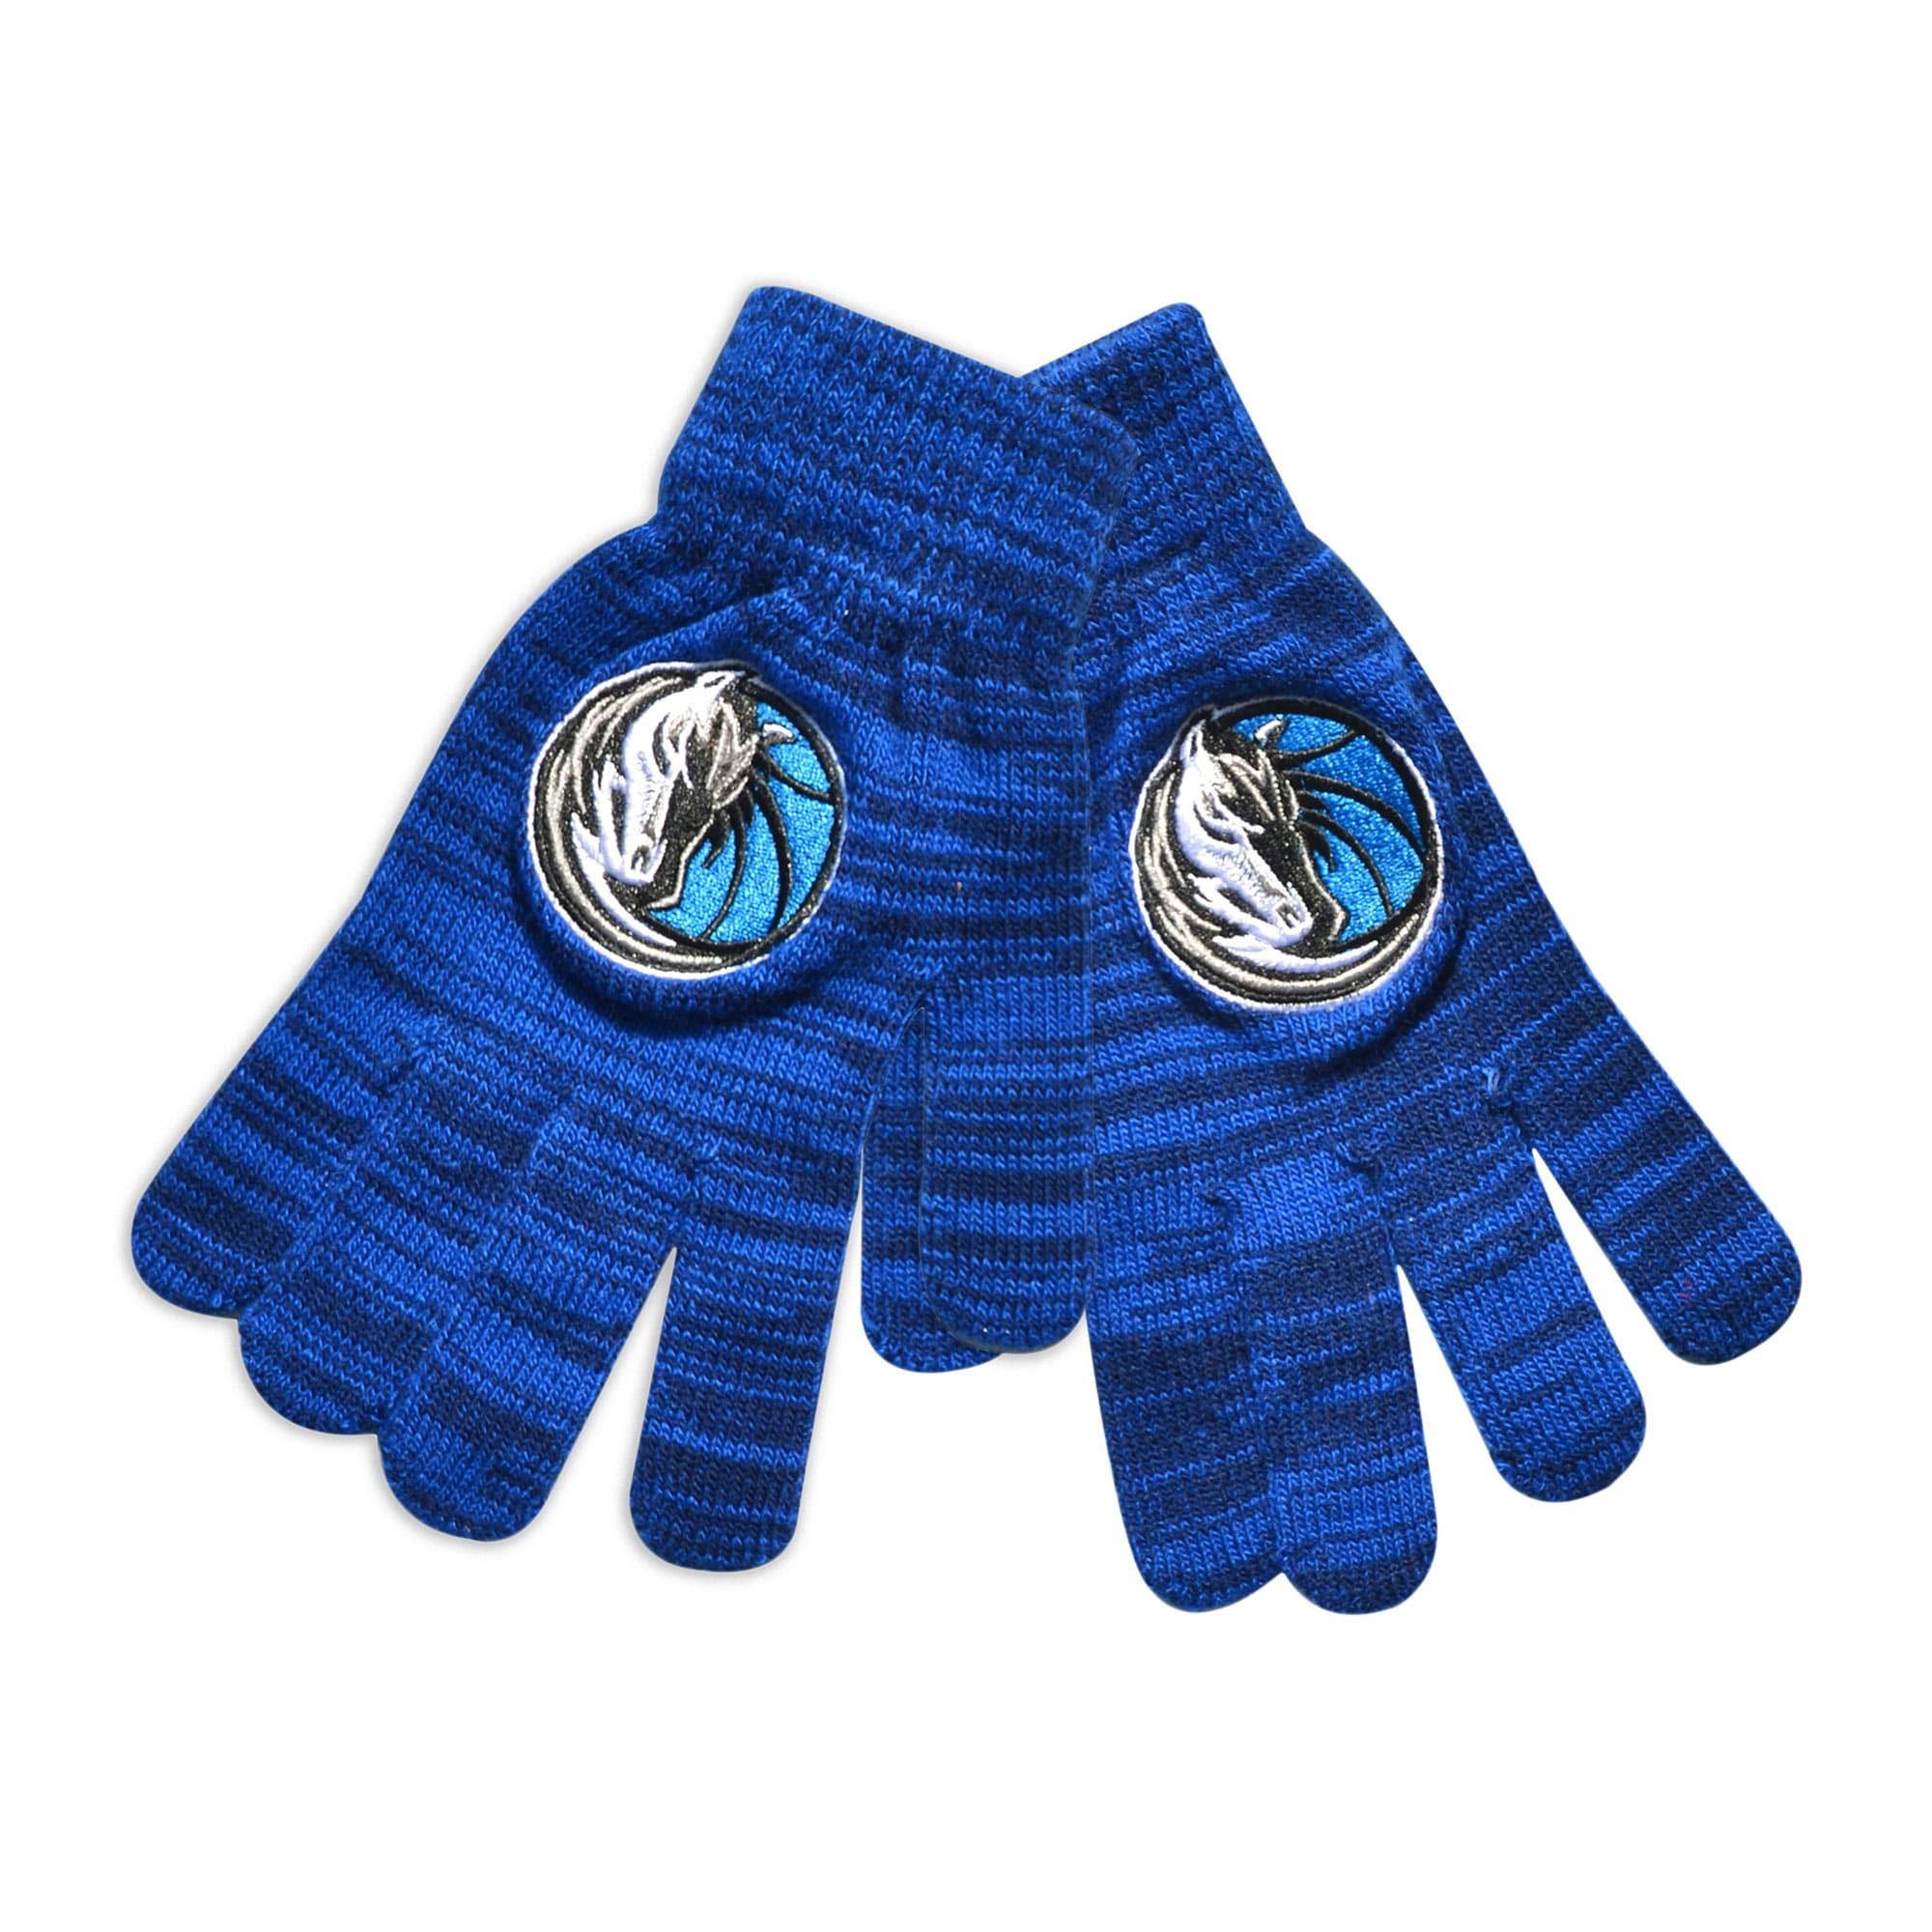 Dallas Mavericks Colorblend Gloves